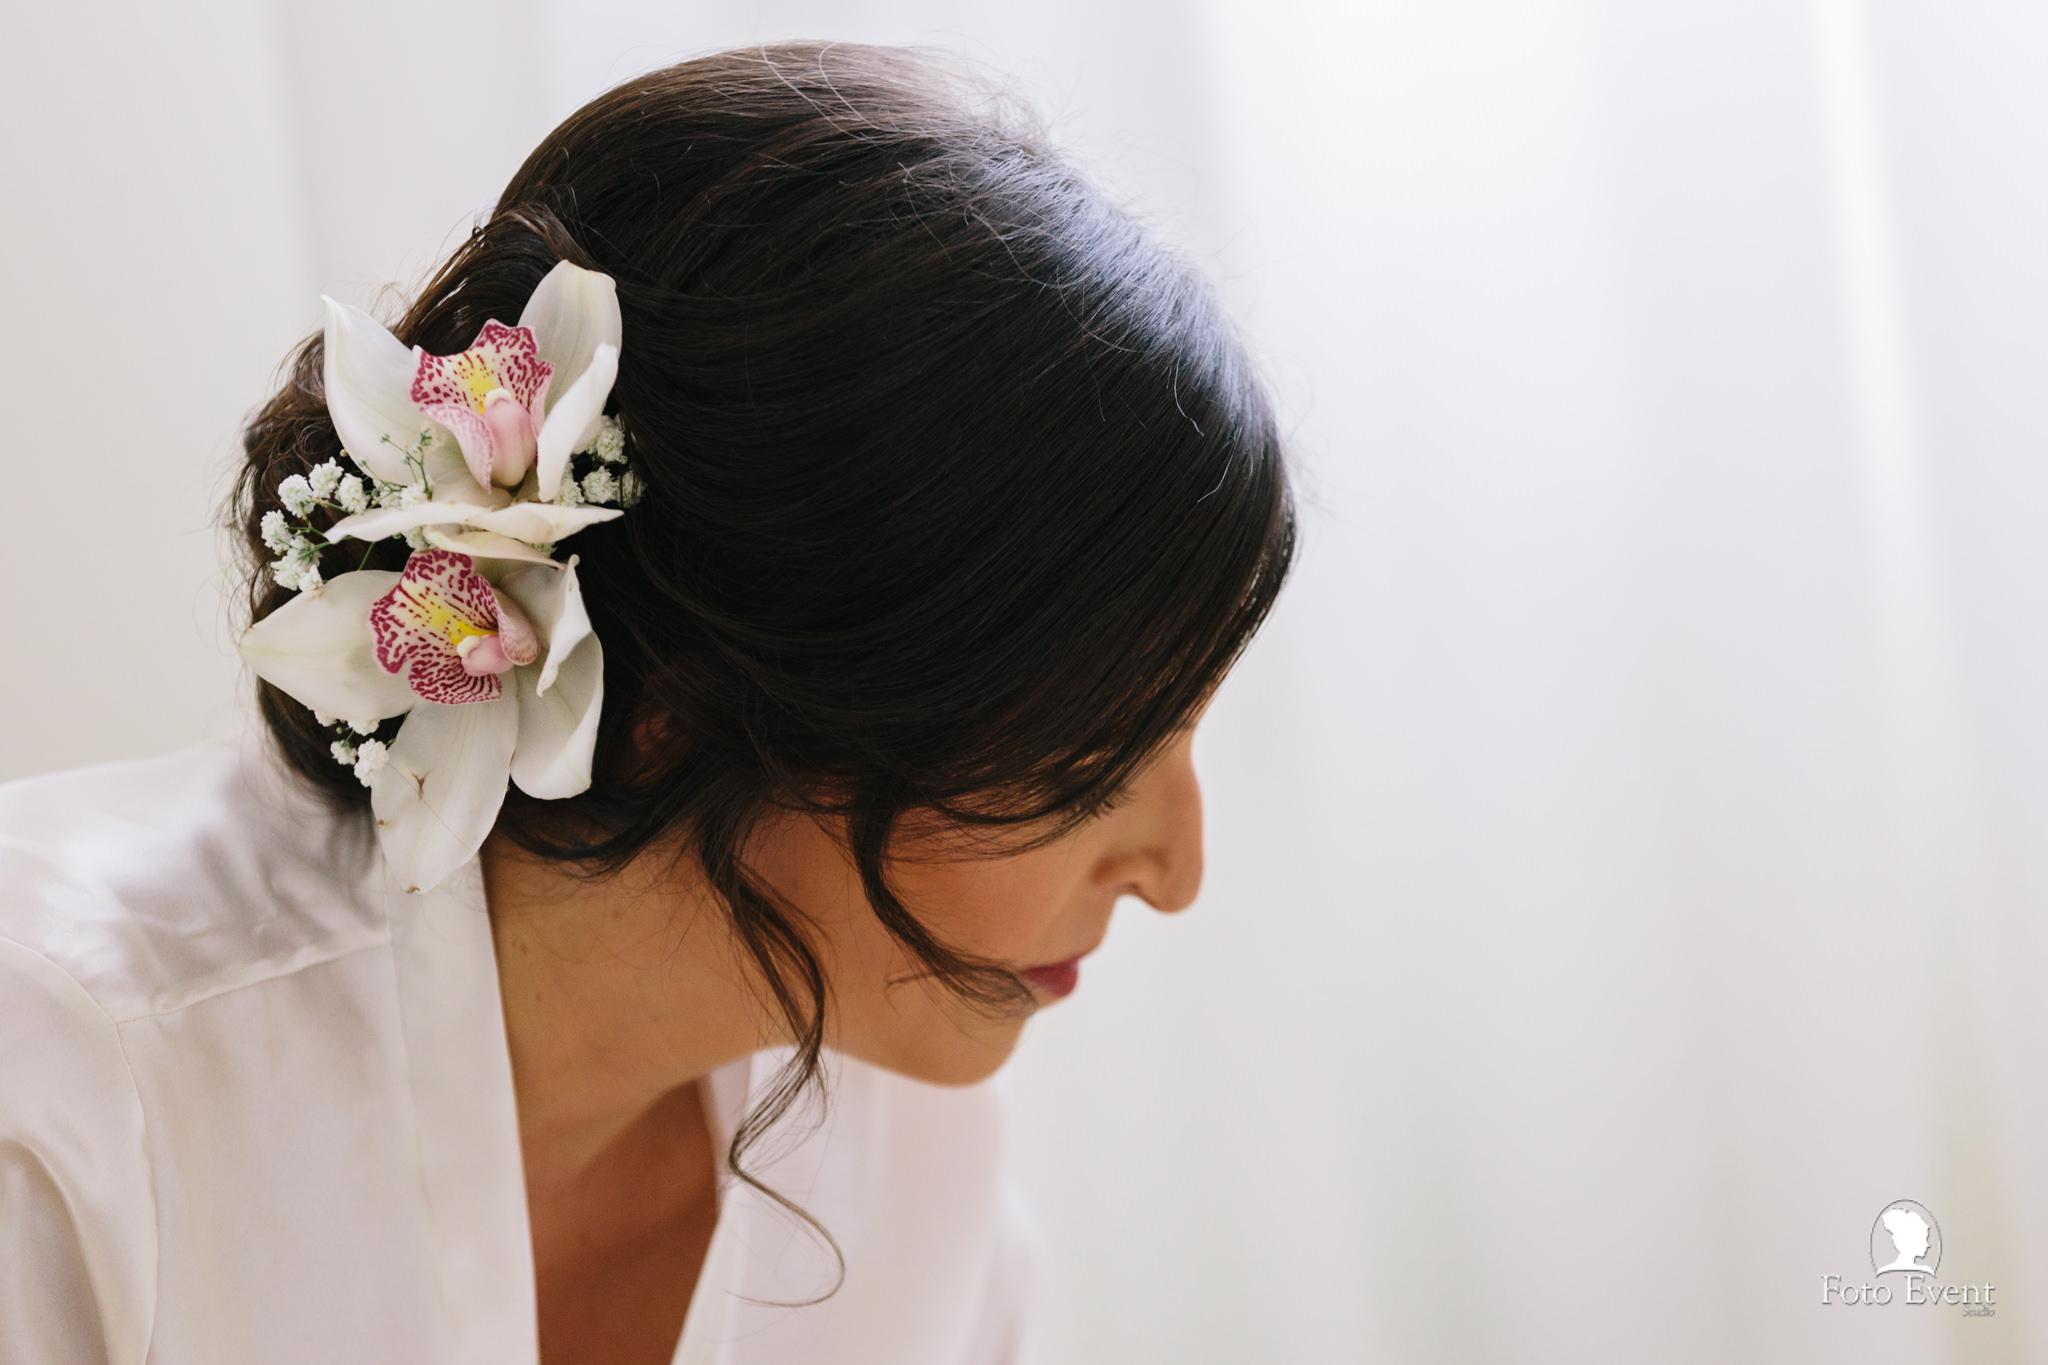 009-2019-09-09-Matrimonio-Dorotea-e-Alberto-Iemmolo-zoom-026